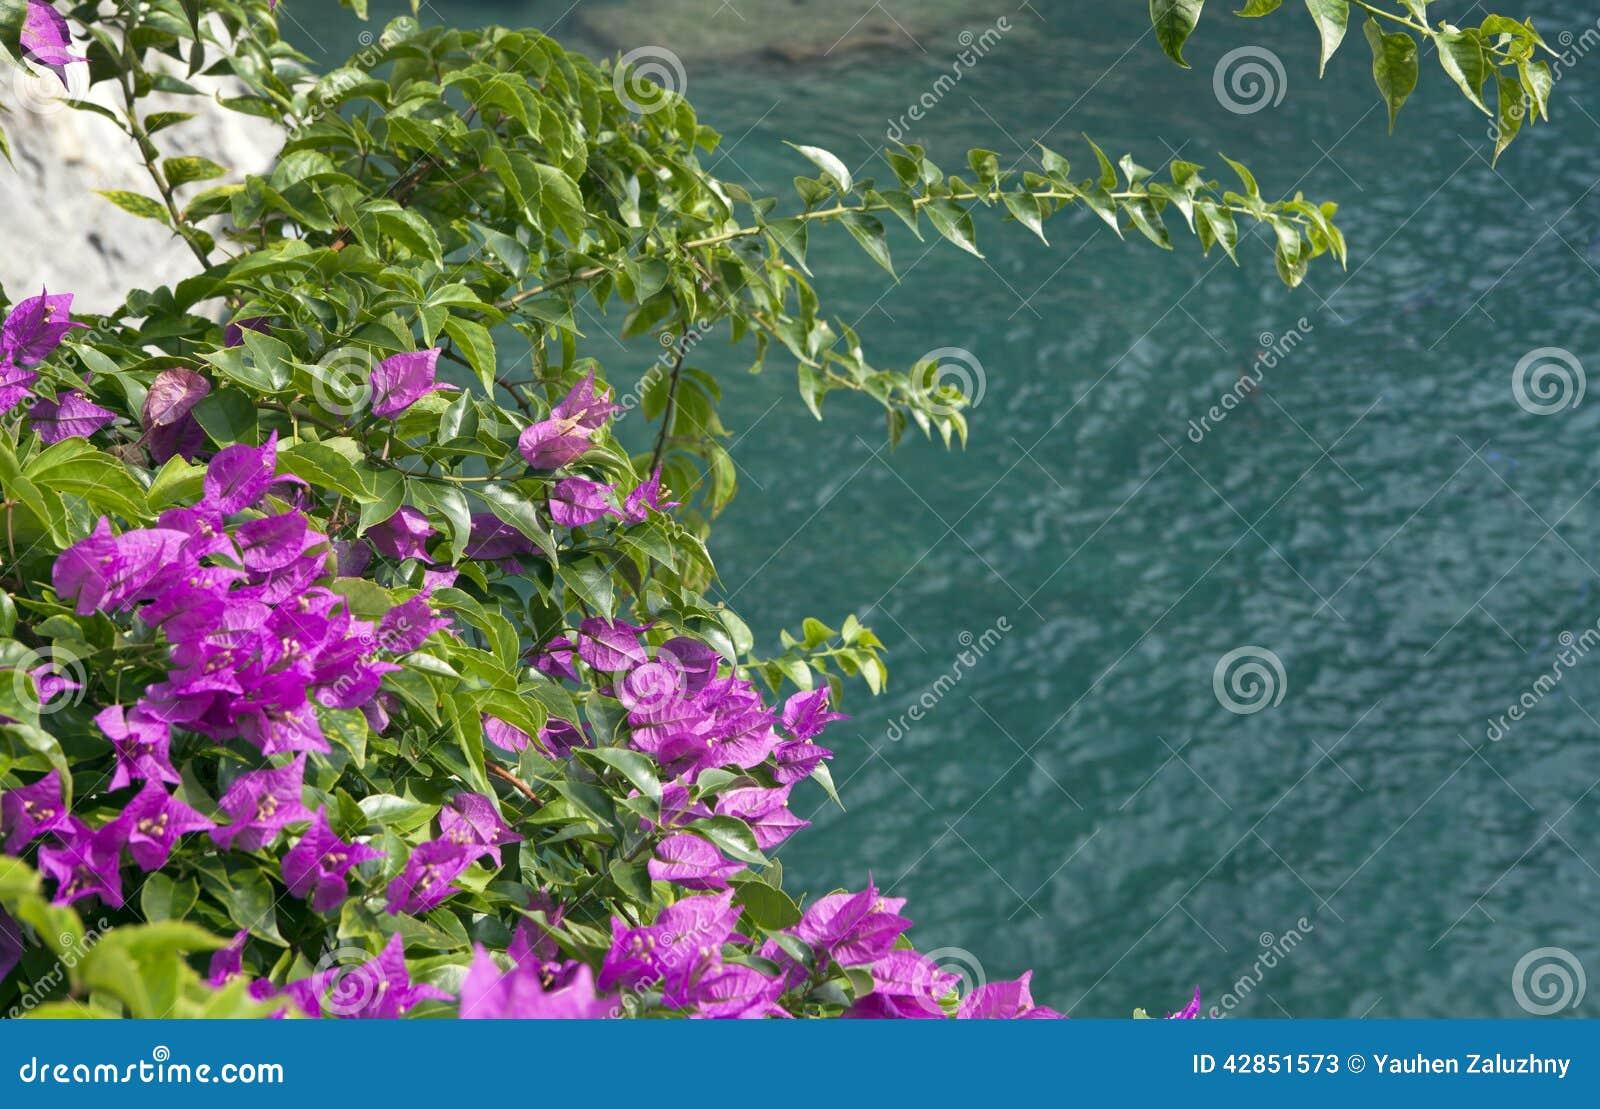 fleurs du sud lumineuses 1 photo stock - image: 42851573